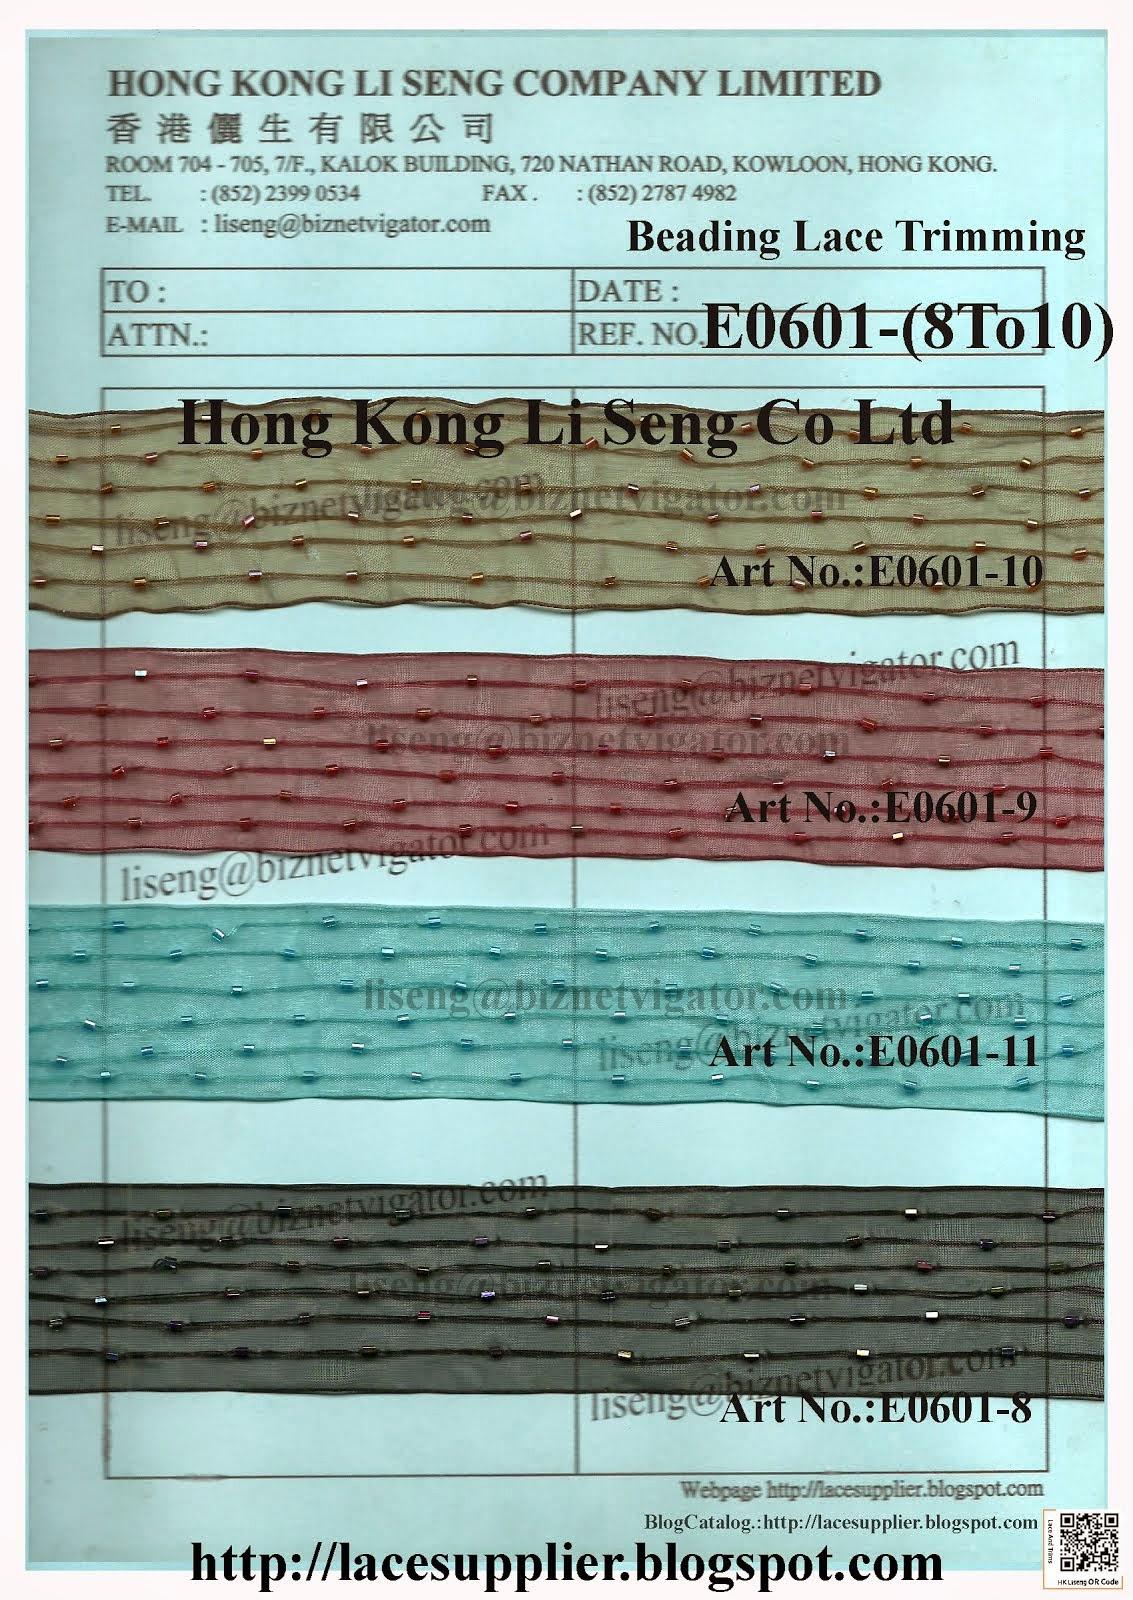 Beading Organza Lace Trimming Wholesale - Hong Kong Li Seng Co Ltd